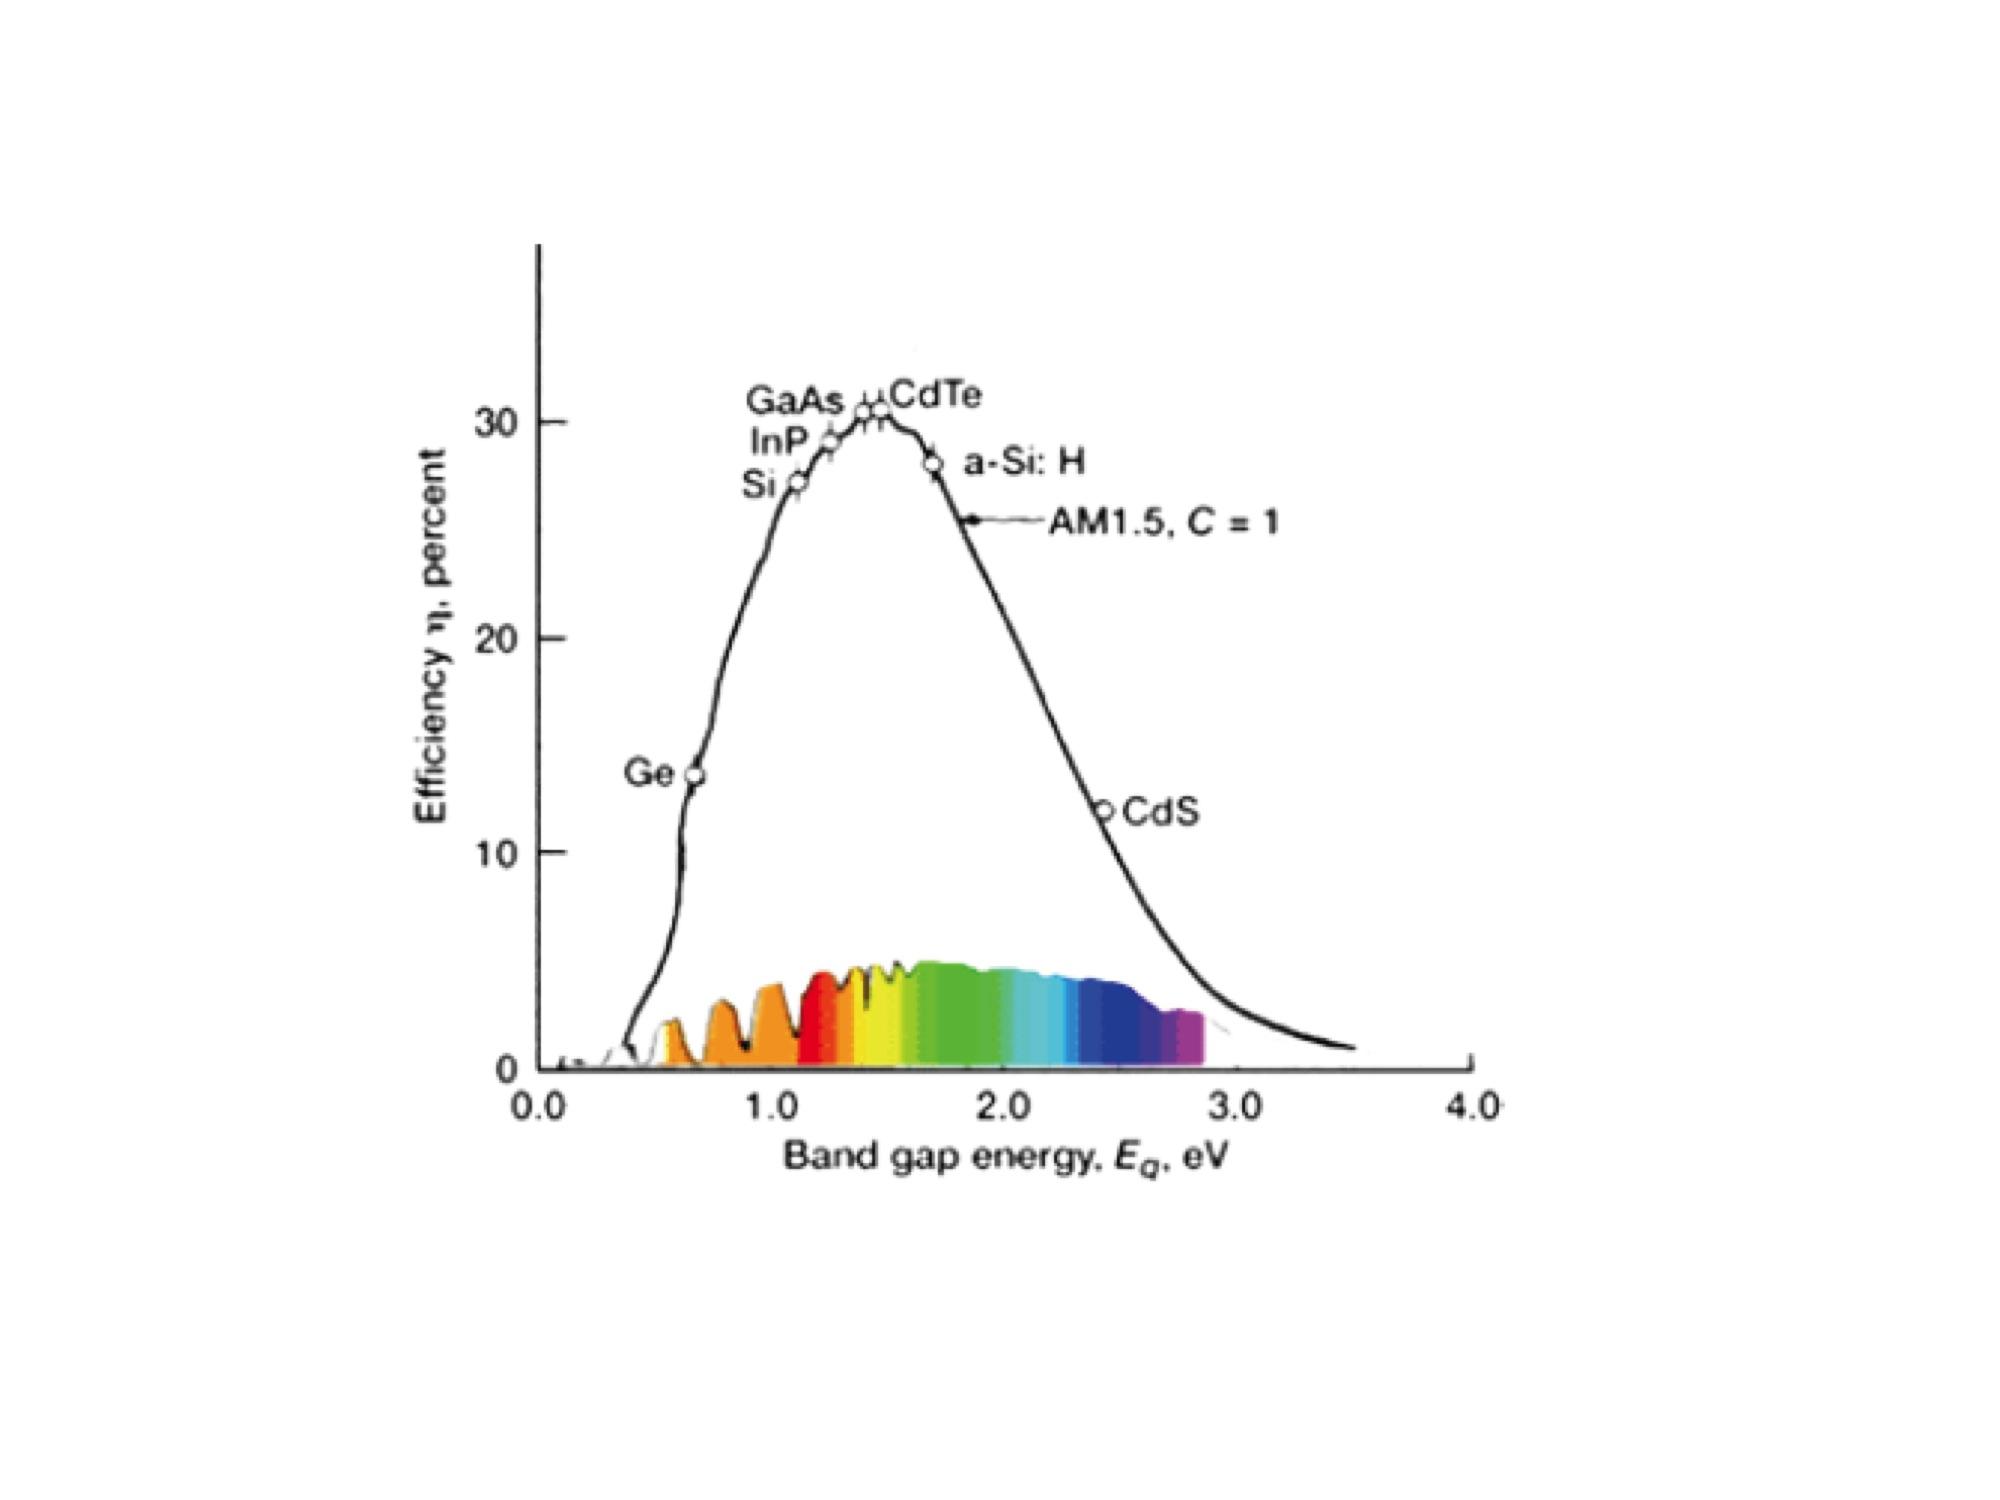 Solar grid parity